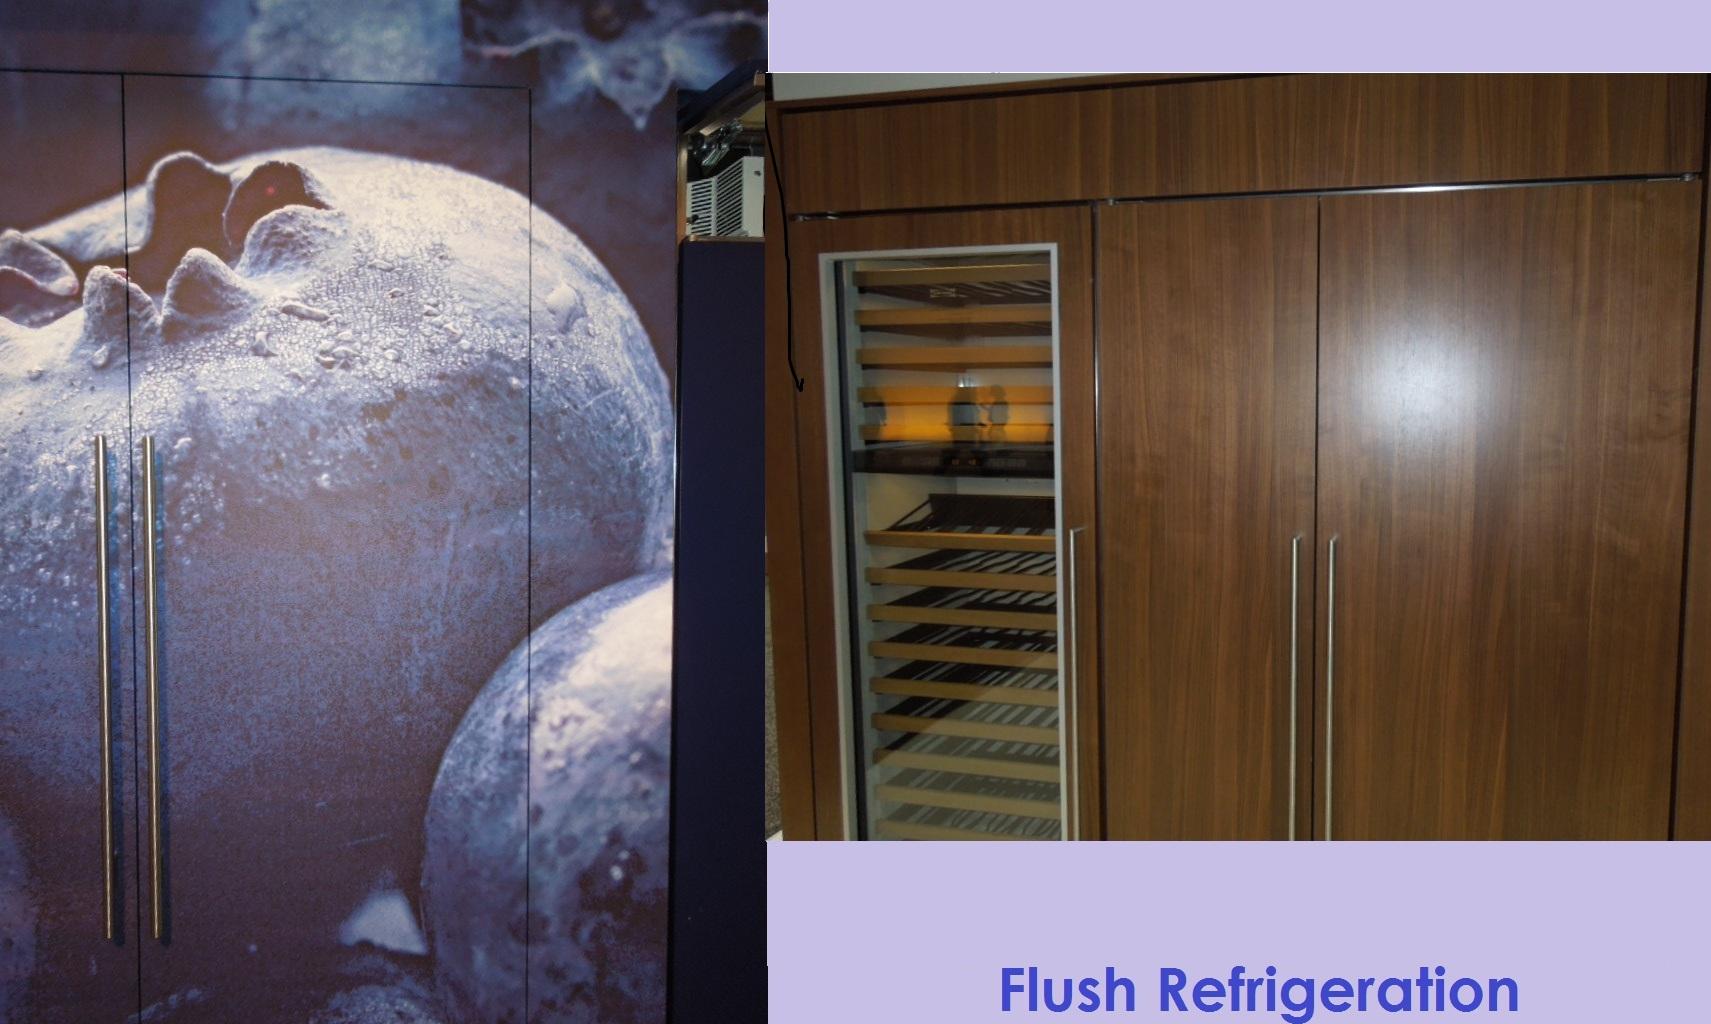 True Flush Refrigerator from Sub-Zero Wolf